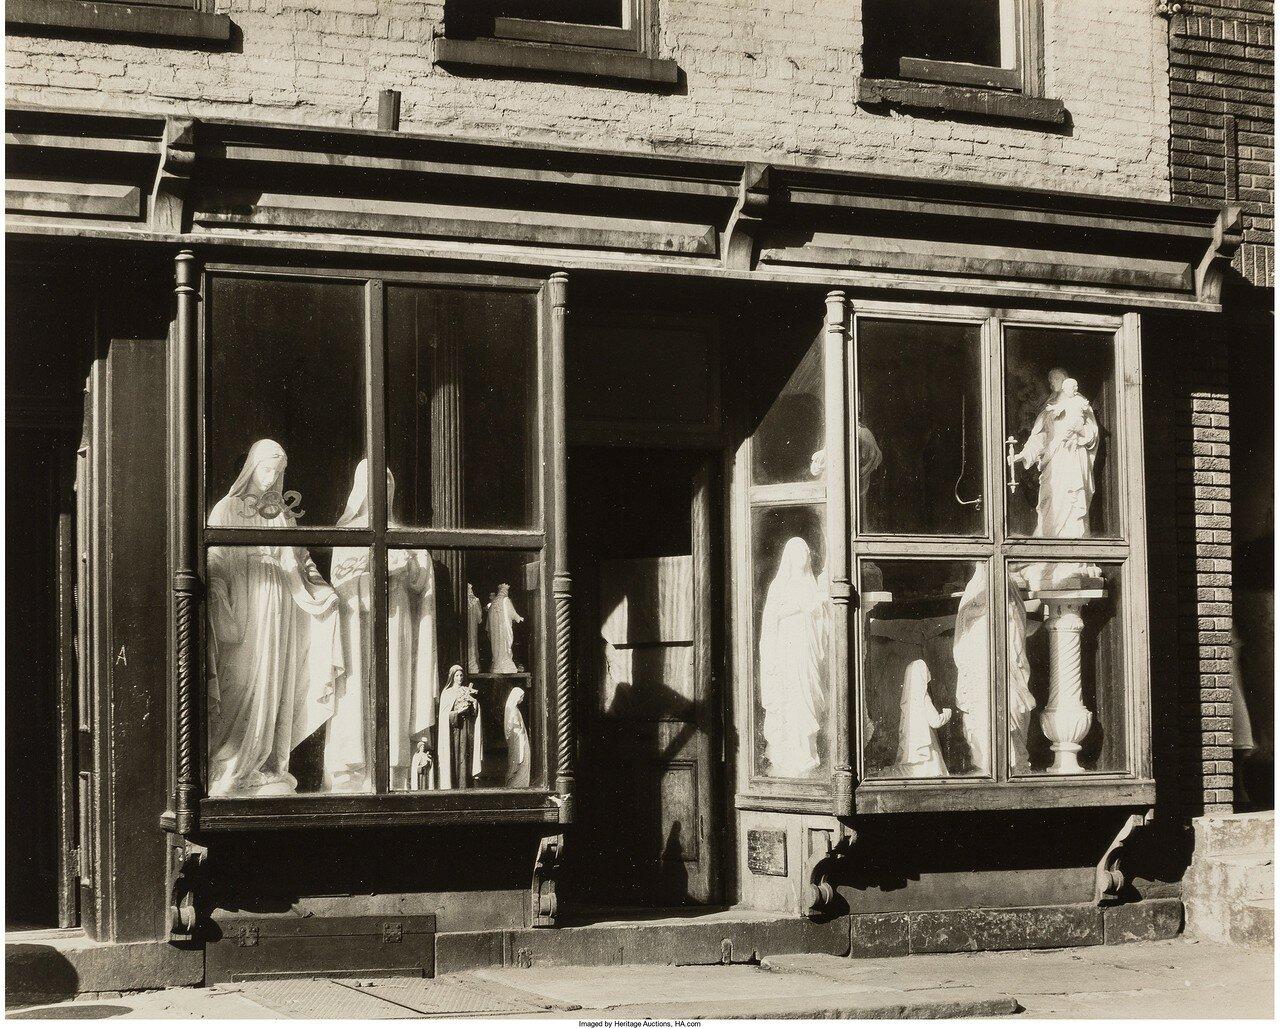 1930. Магазин скульптур,Уотер-стрит